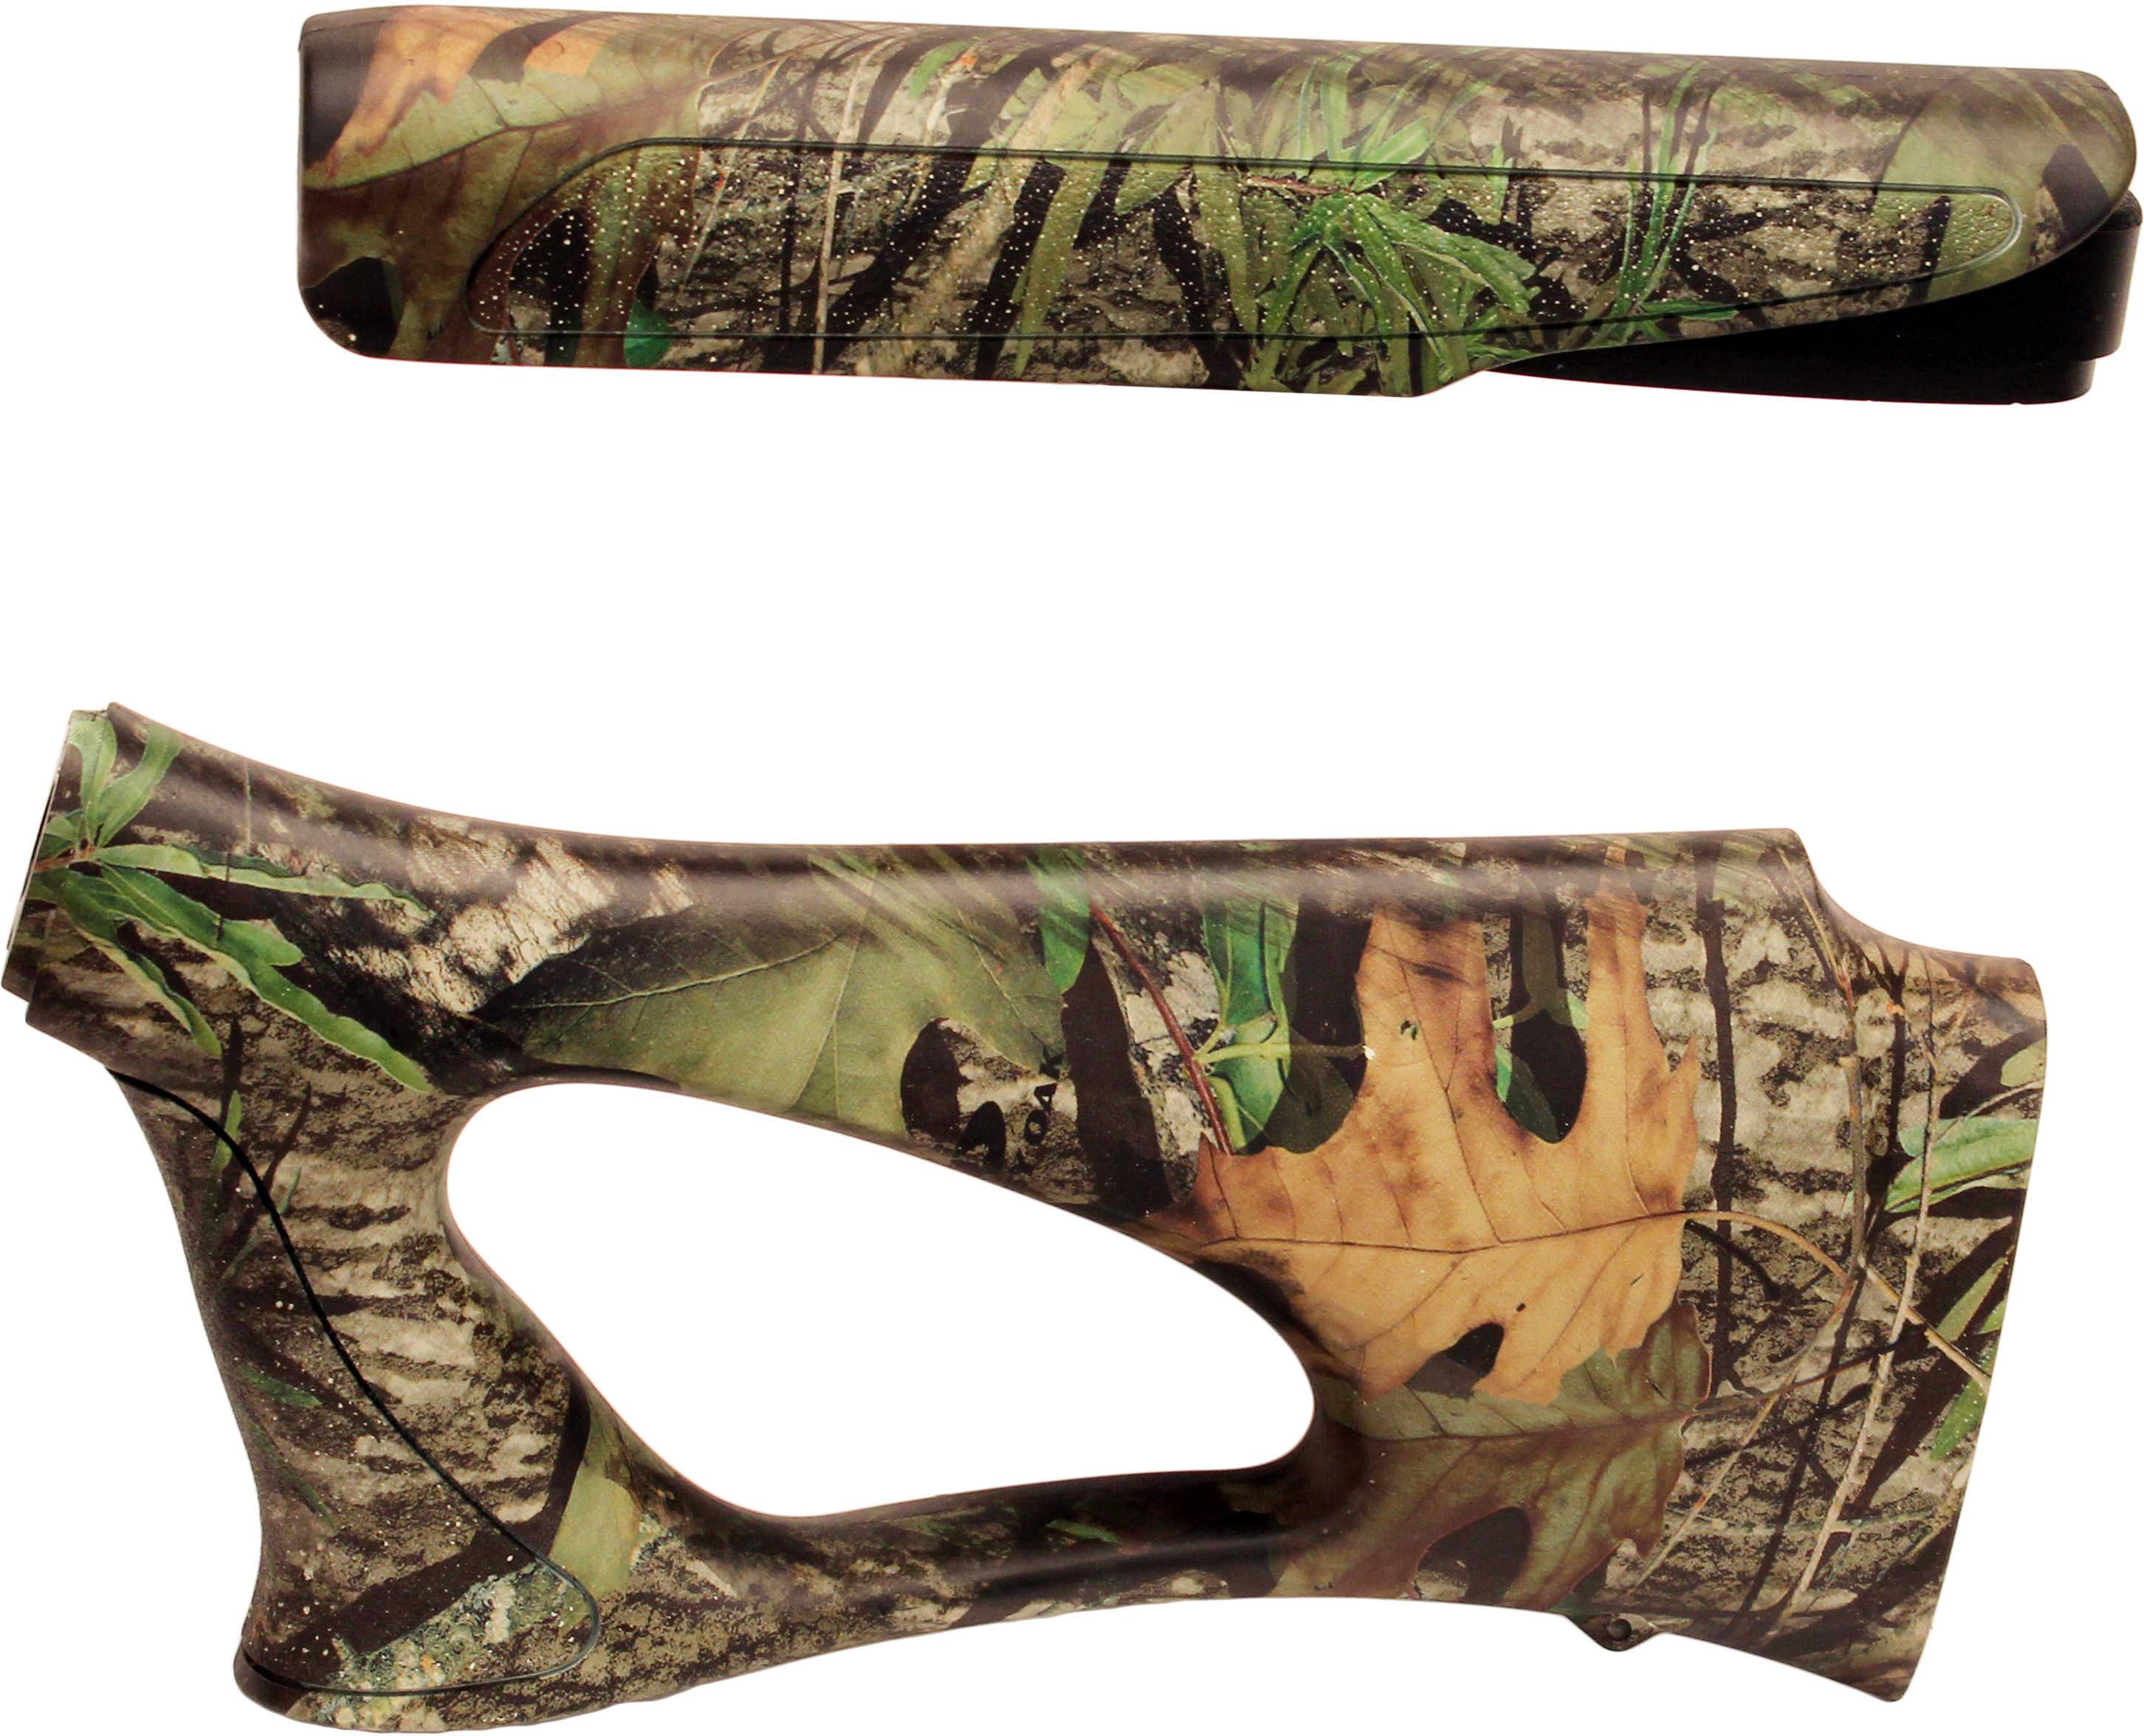 Remington ShurShot Stock Fits Remington 870 12 Gauge Mossy Oak Break Up Finish 19545